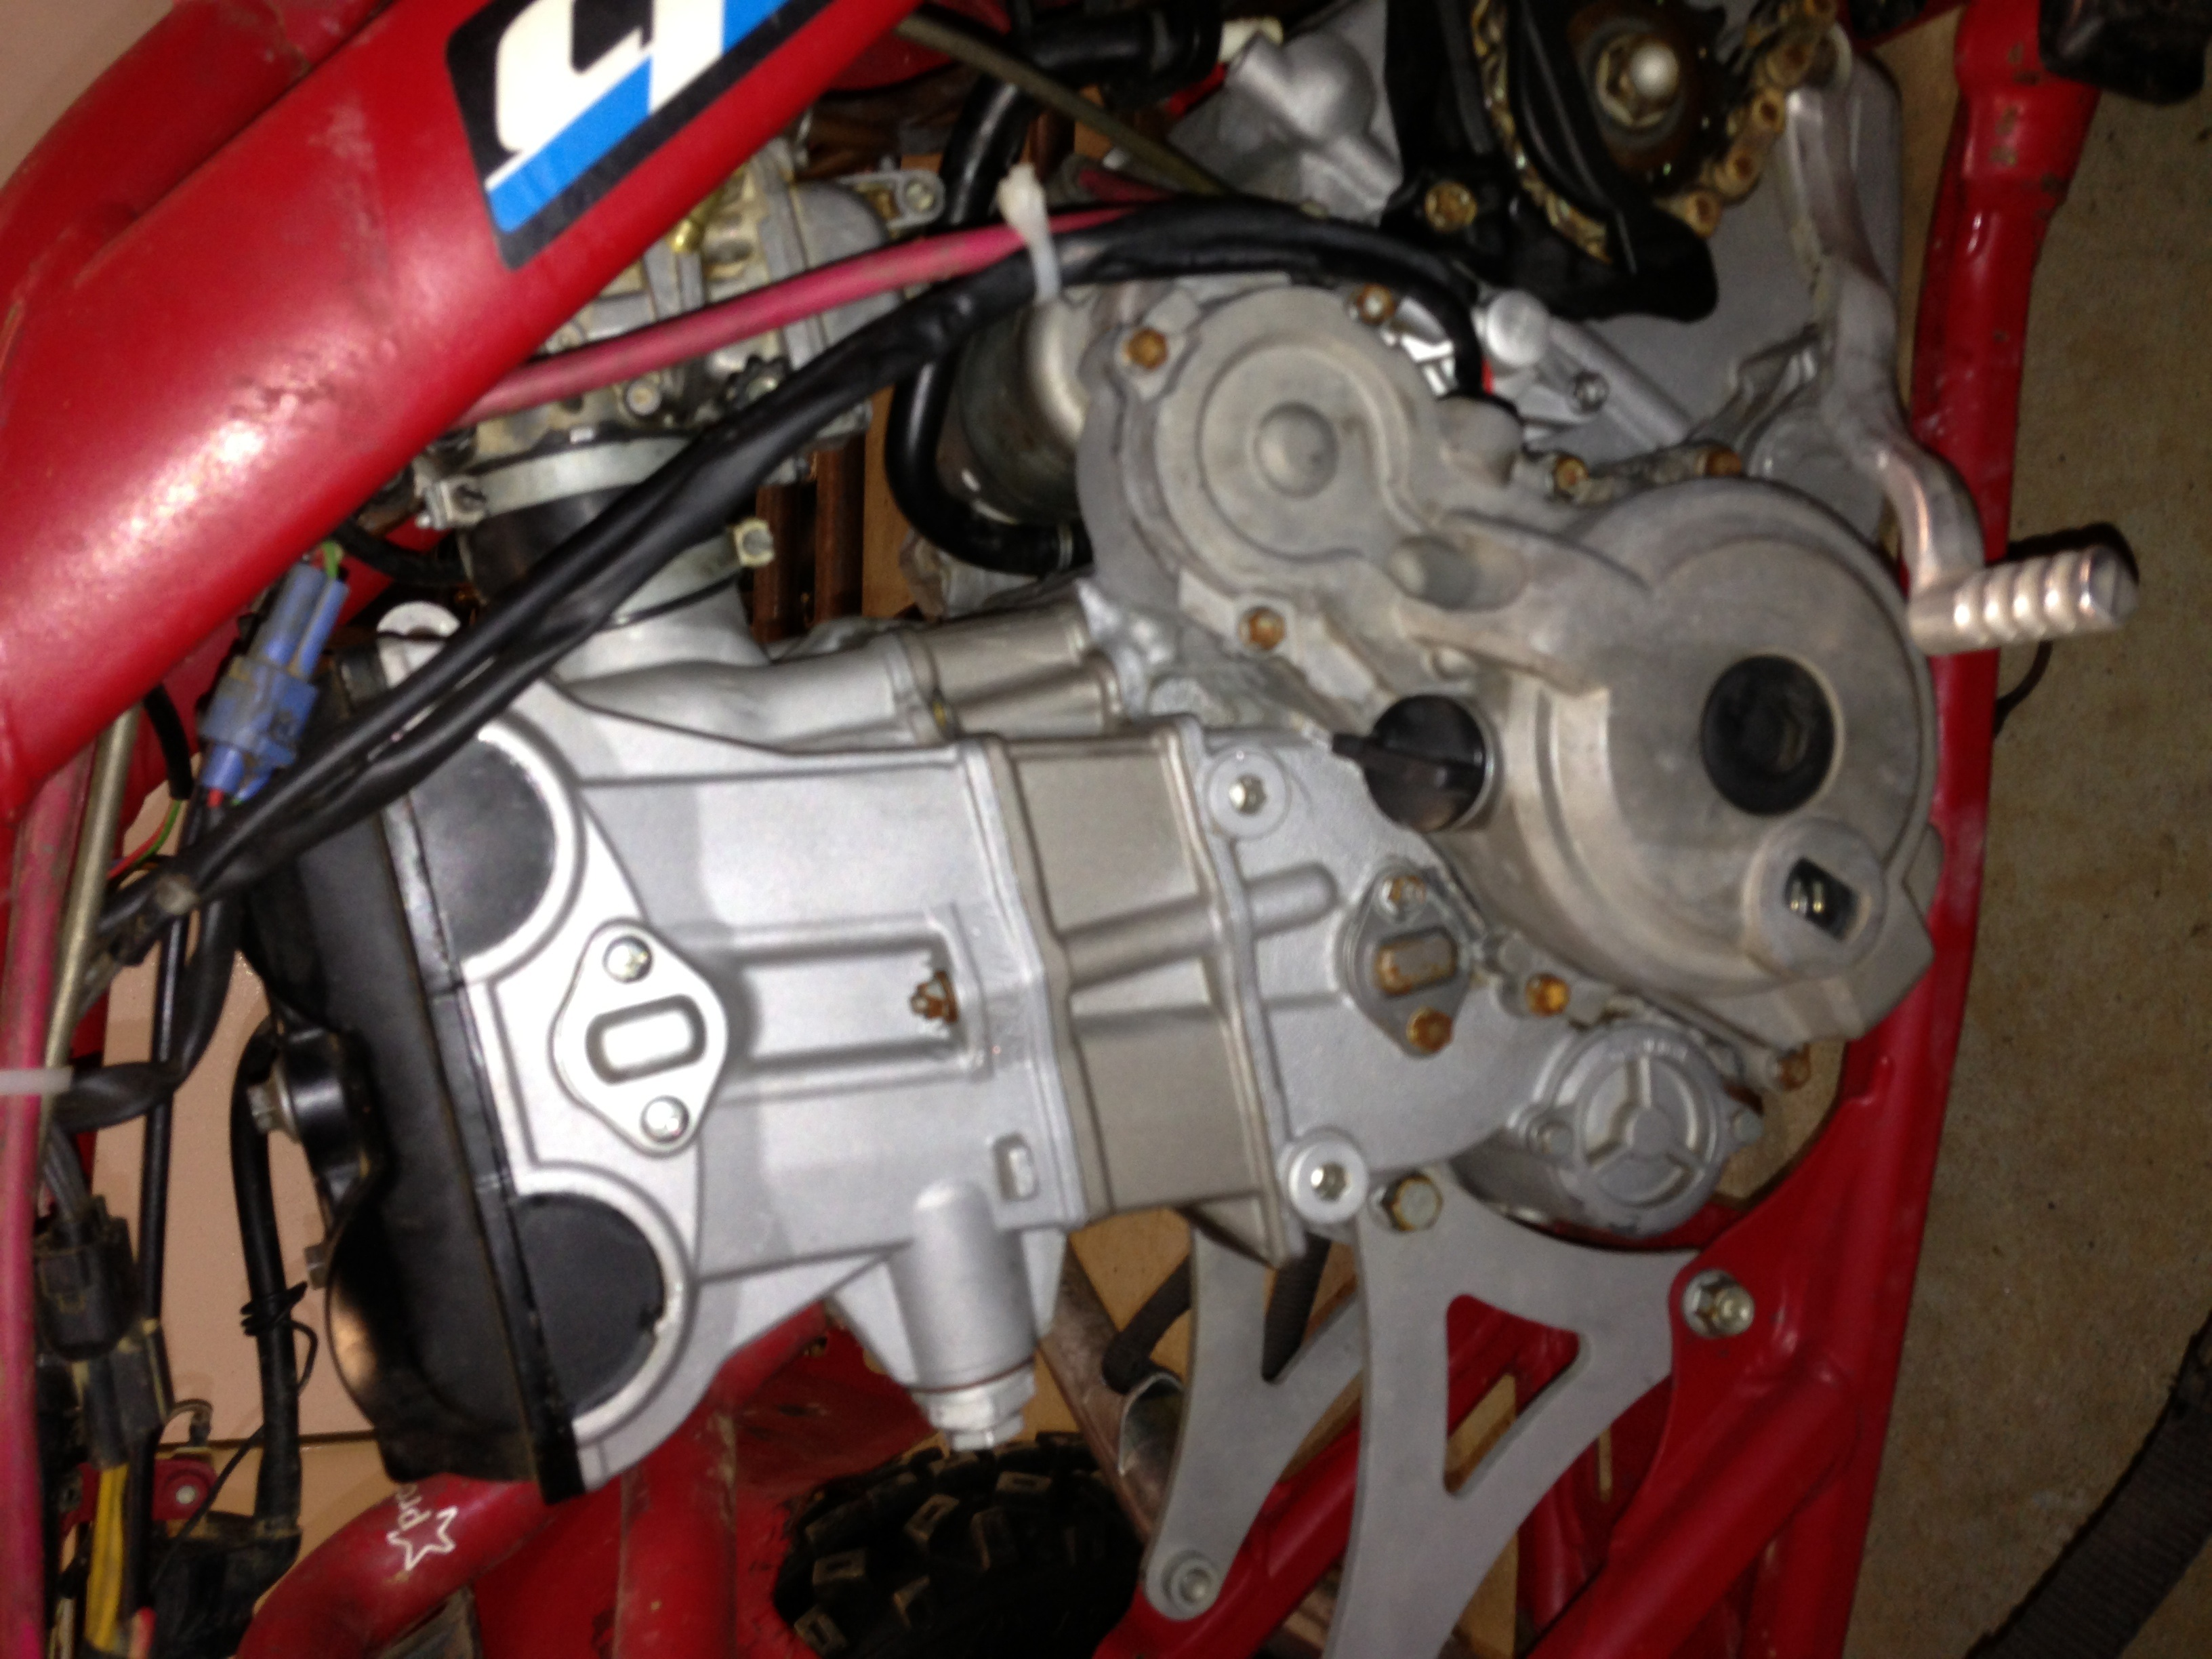 09 Sx Engine Baldwin Carbwiring Harnesscdi Battery Relocation Carburetor Wiring Harness Box